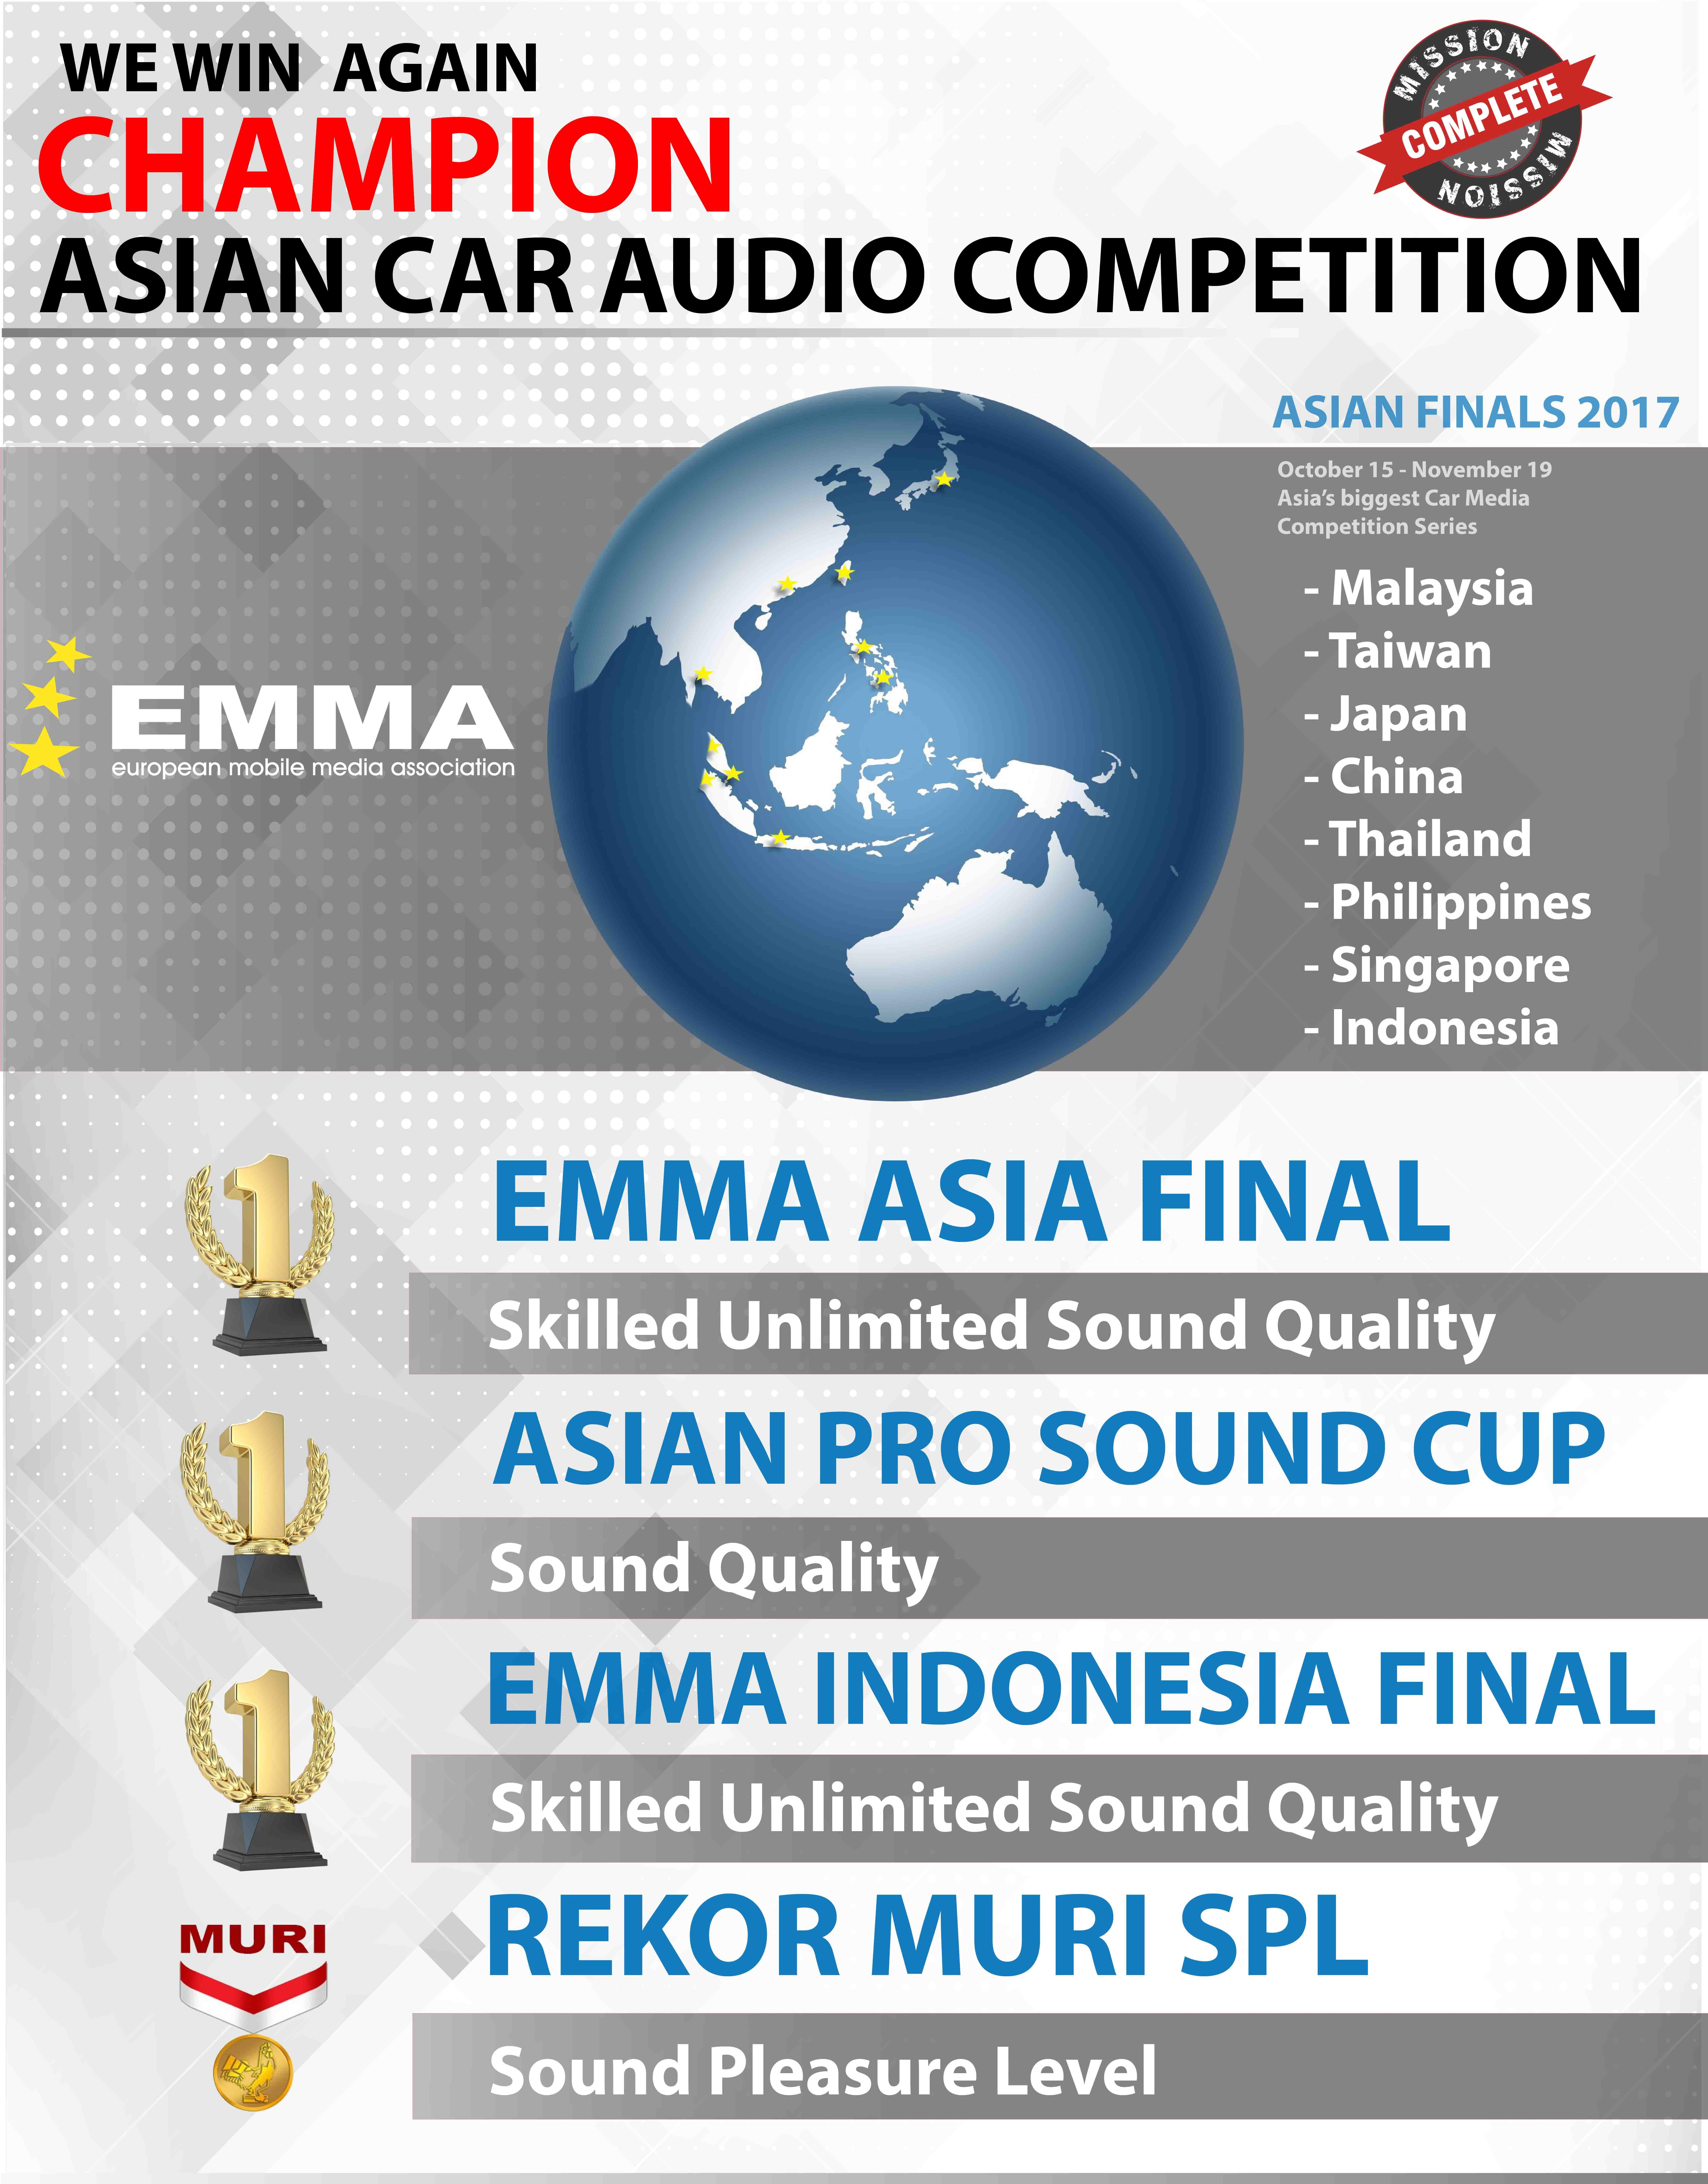 Innovation Car Audio Museum Rekor Dunia Indonesia Kab Semarang